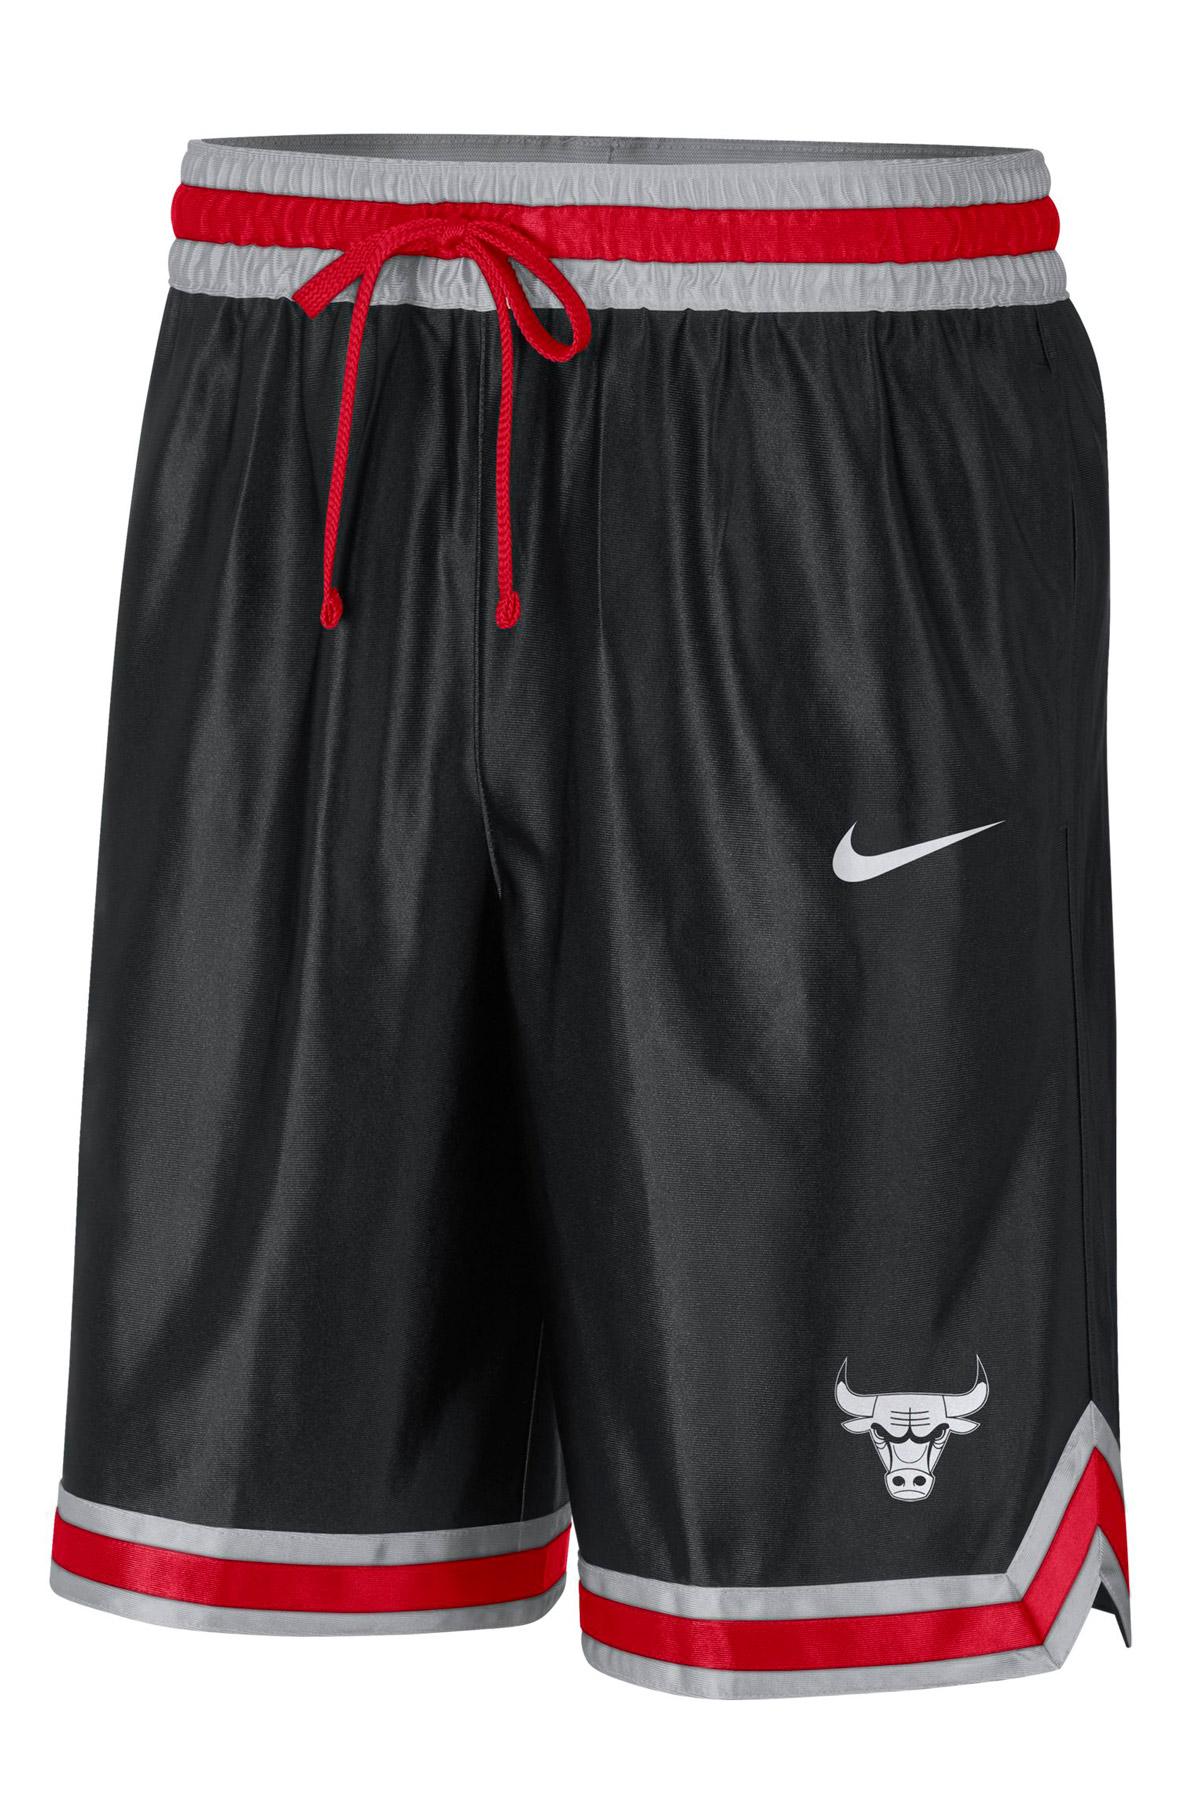 Chicago Bulls Courtside NBA Shorts Black/Grey Fog/University Red